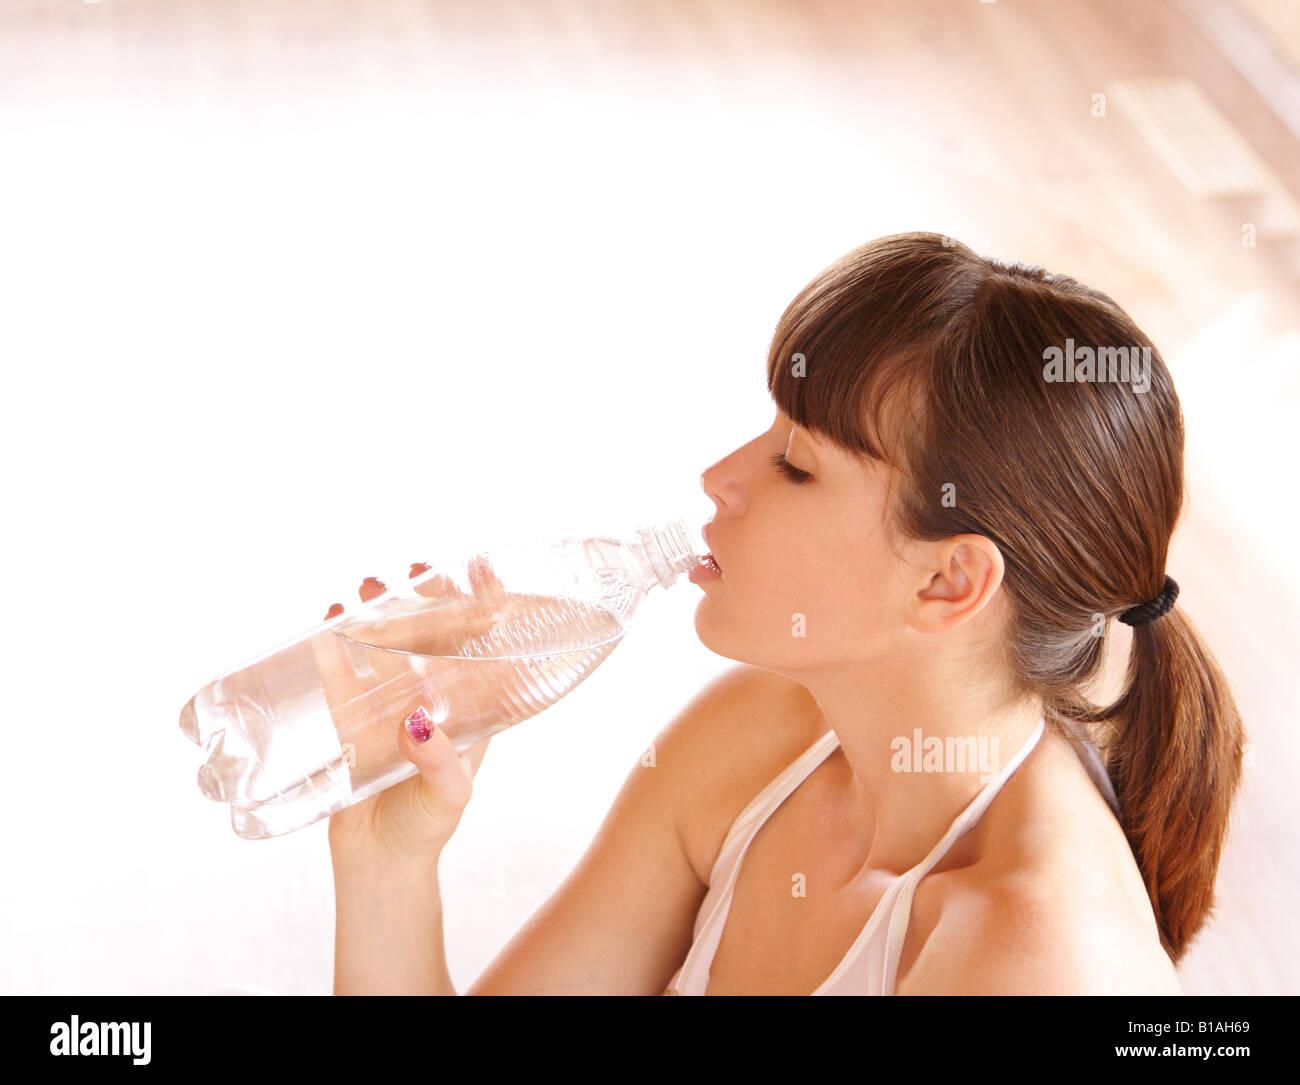 Junge Frau Trinkwasser nach dem training Stockbild